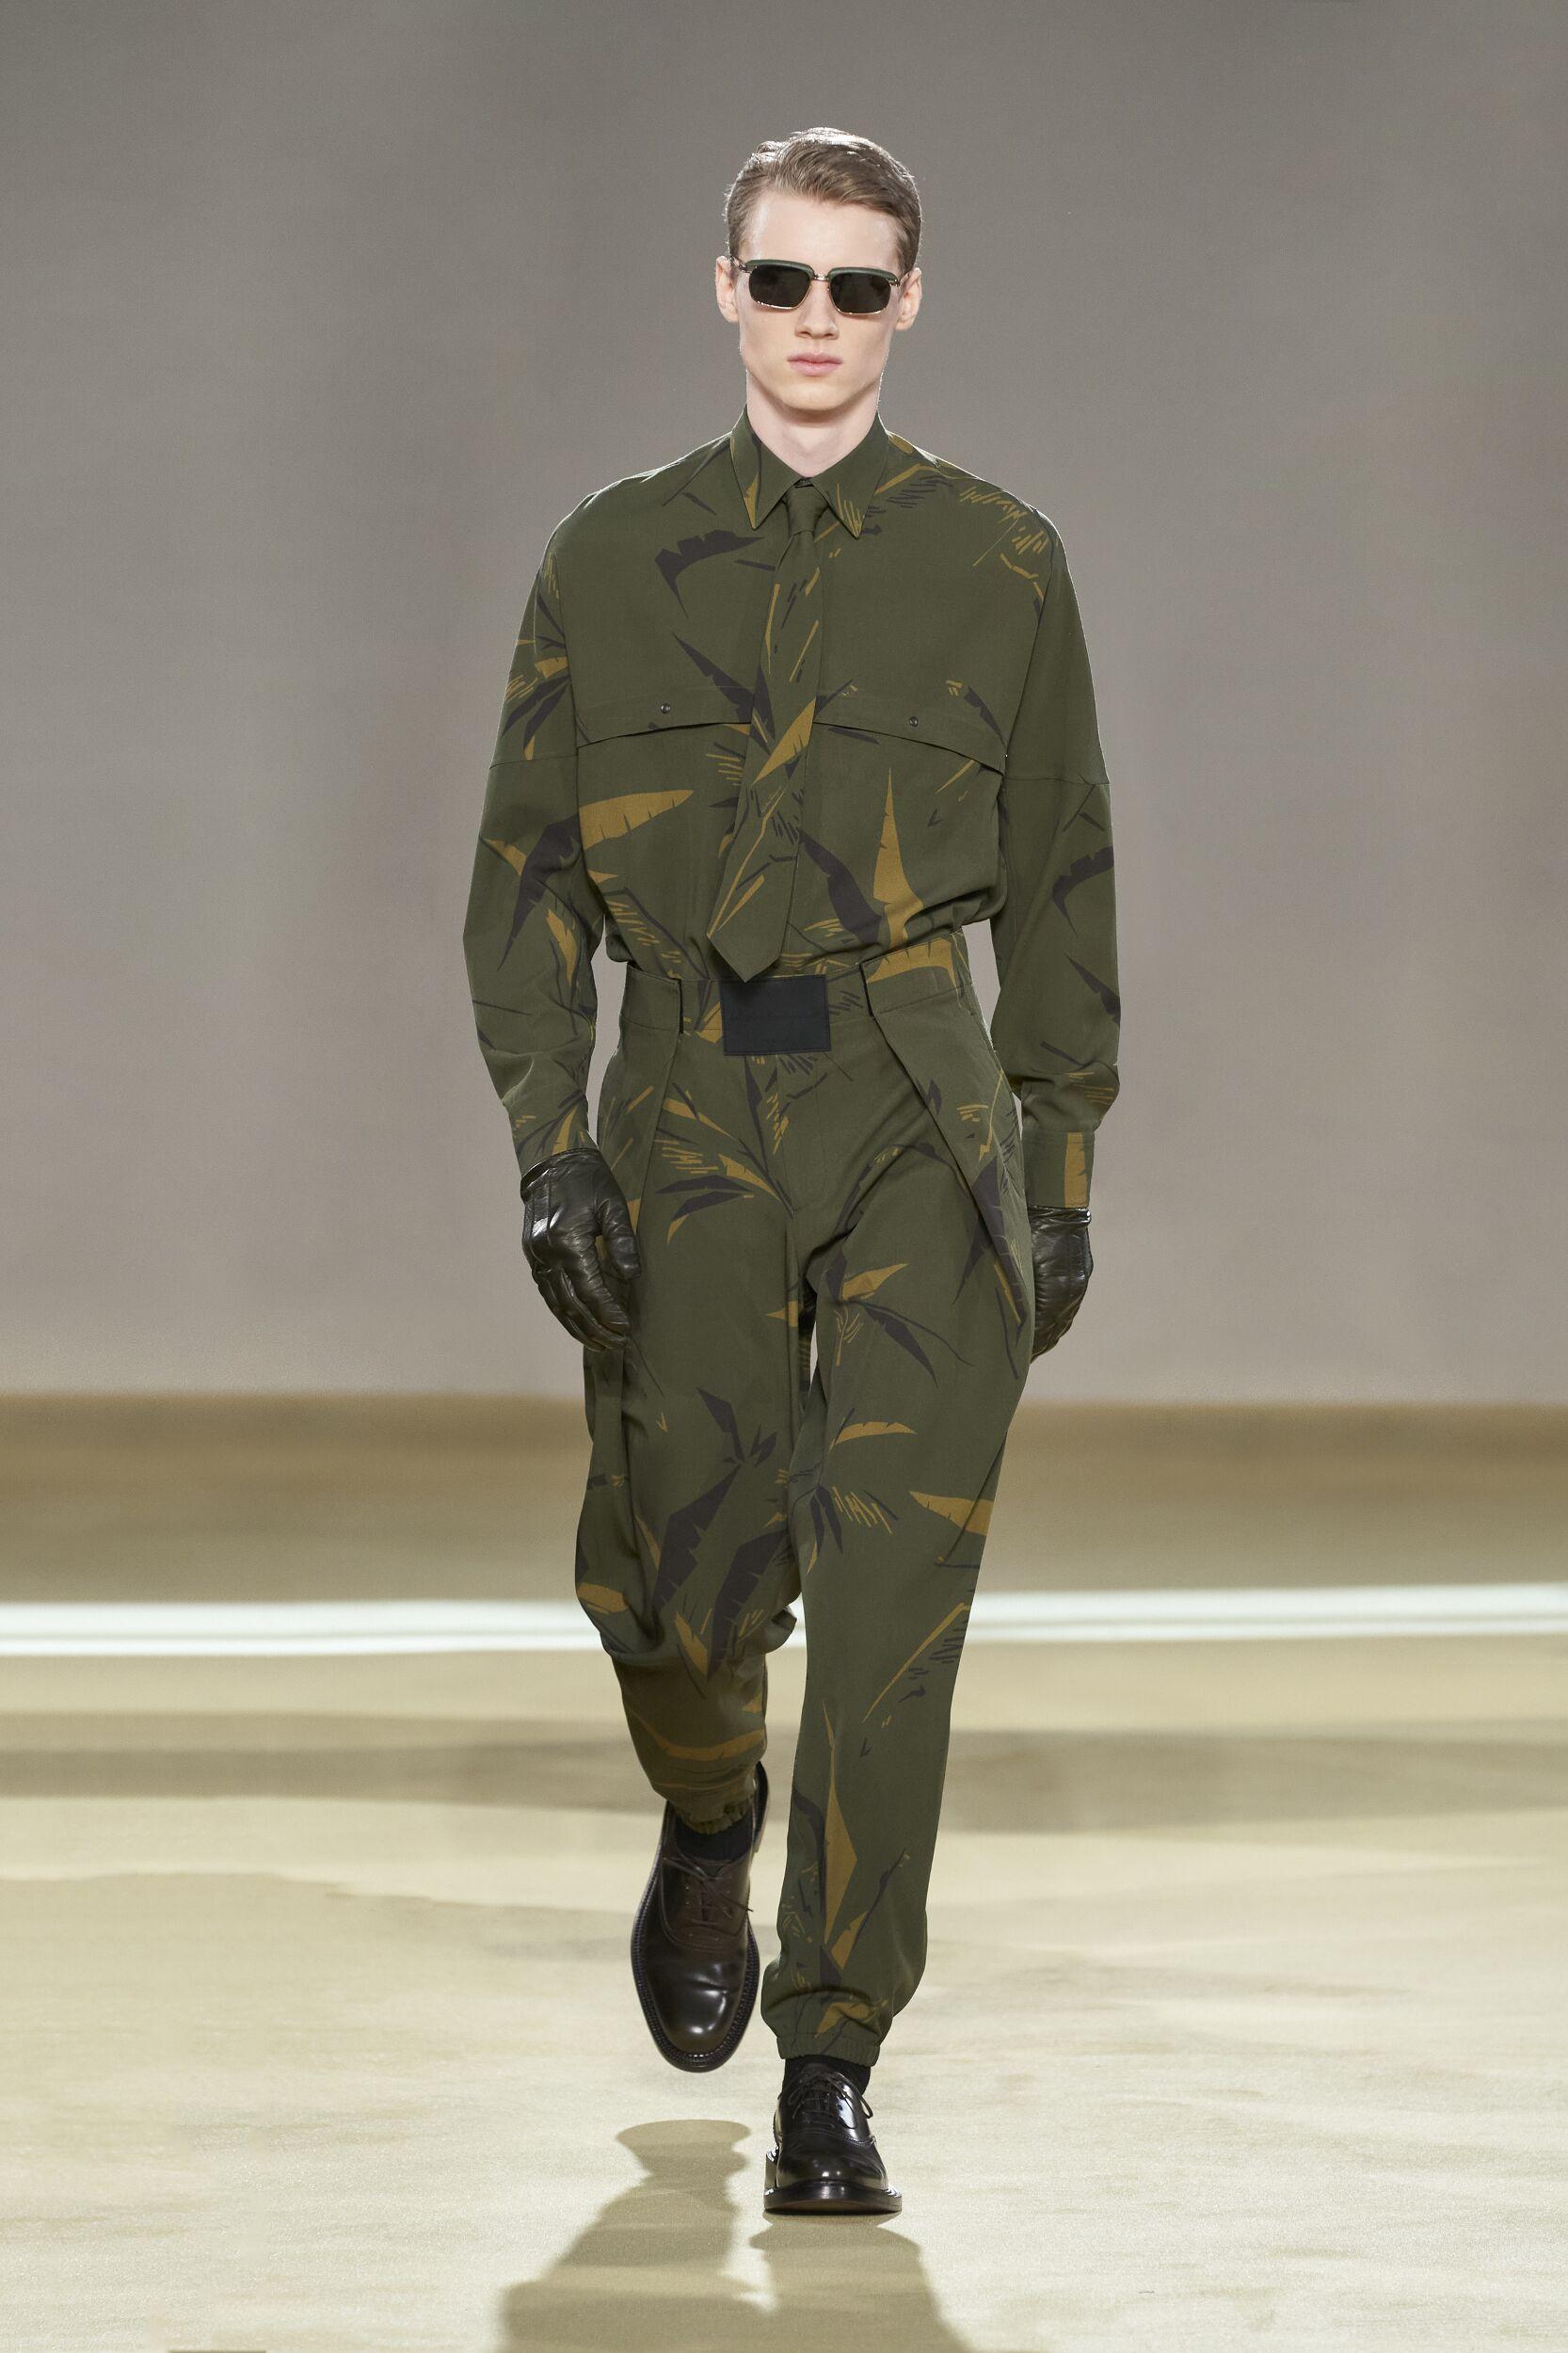 Catwalk Salvatore Ferragamo Man Fashion Show Winter 2020